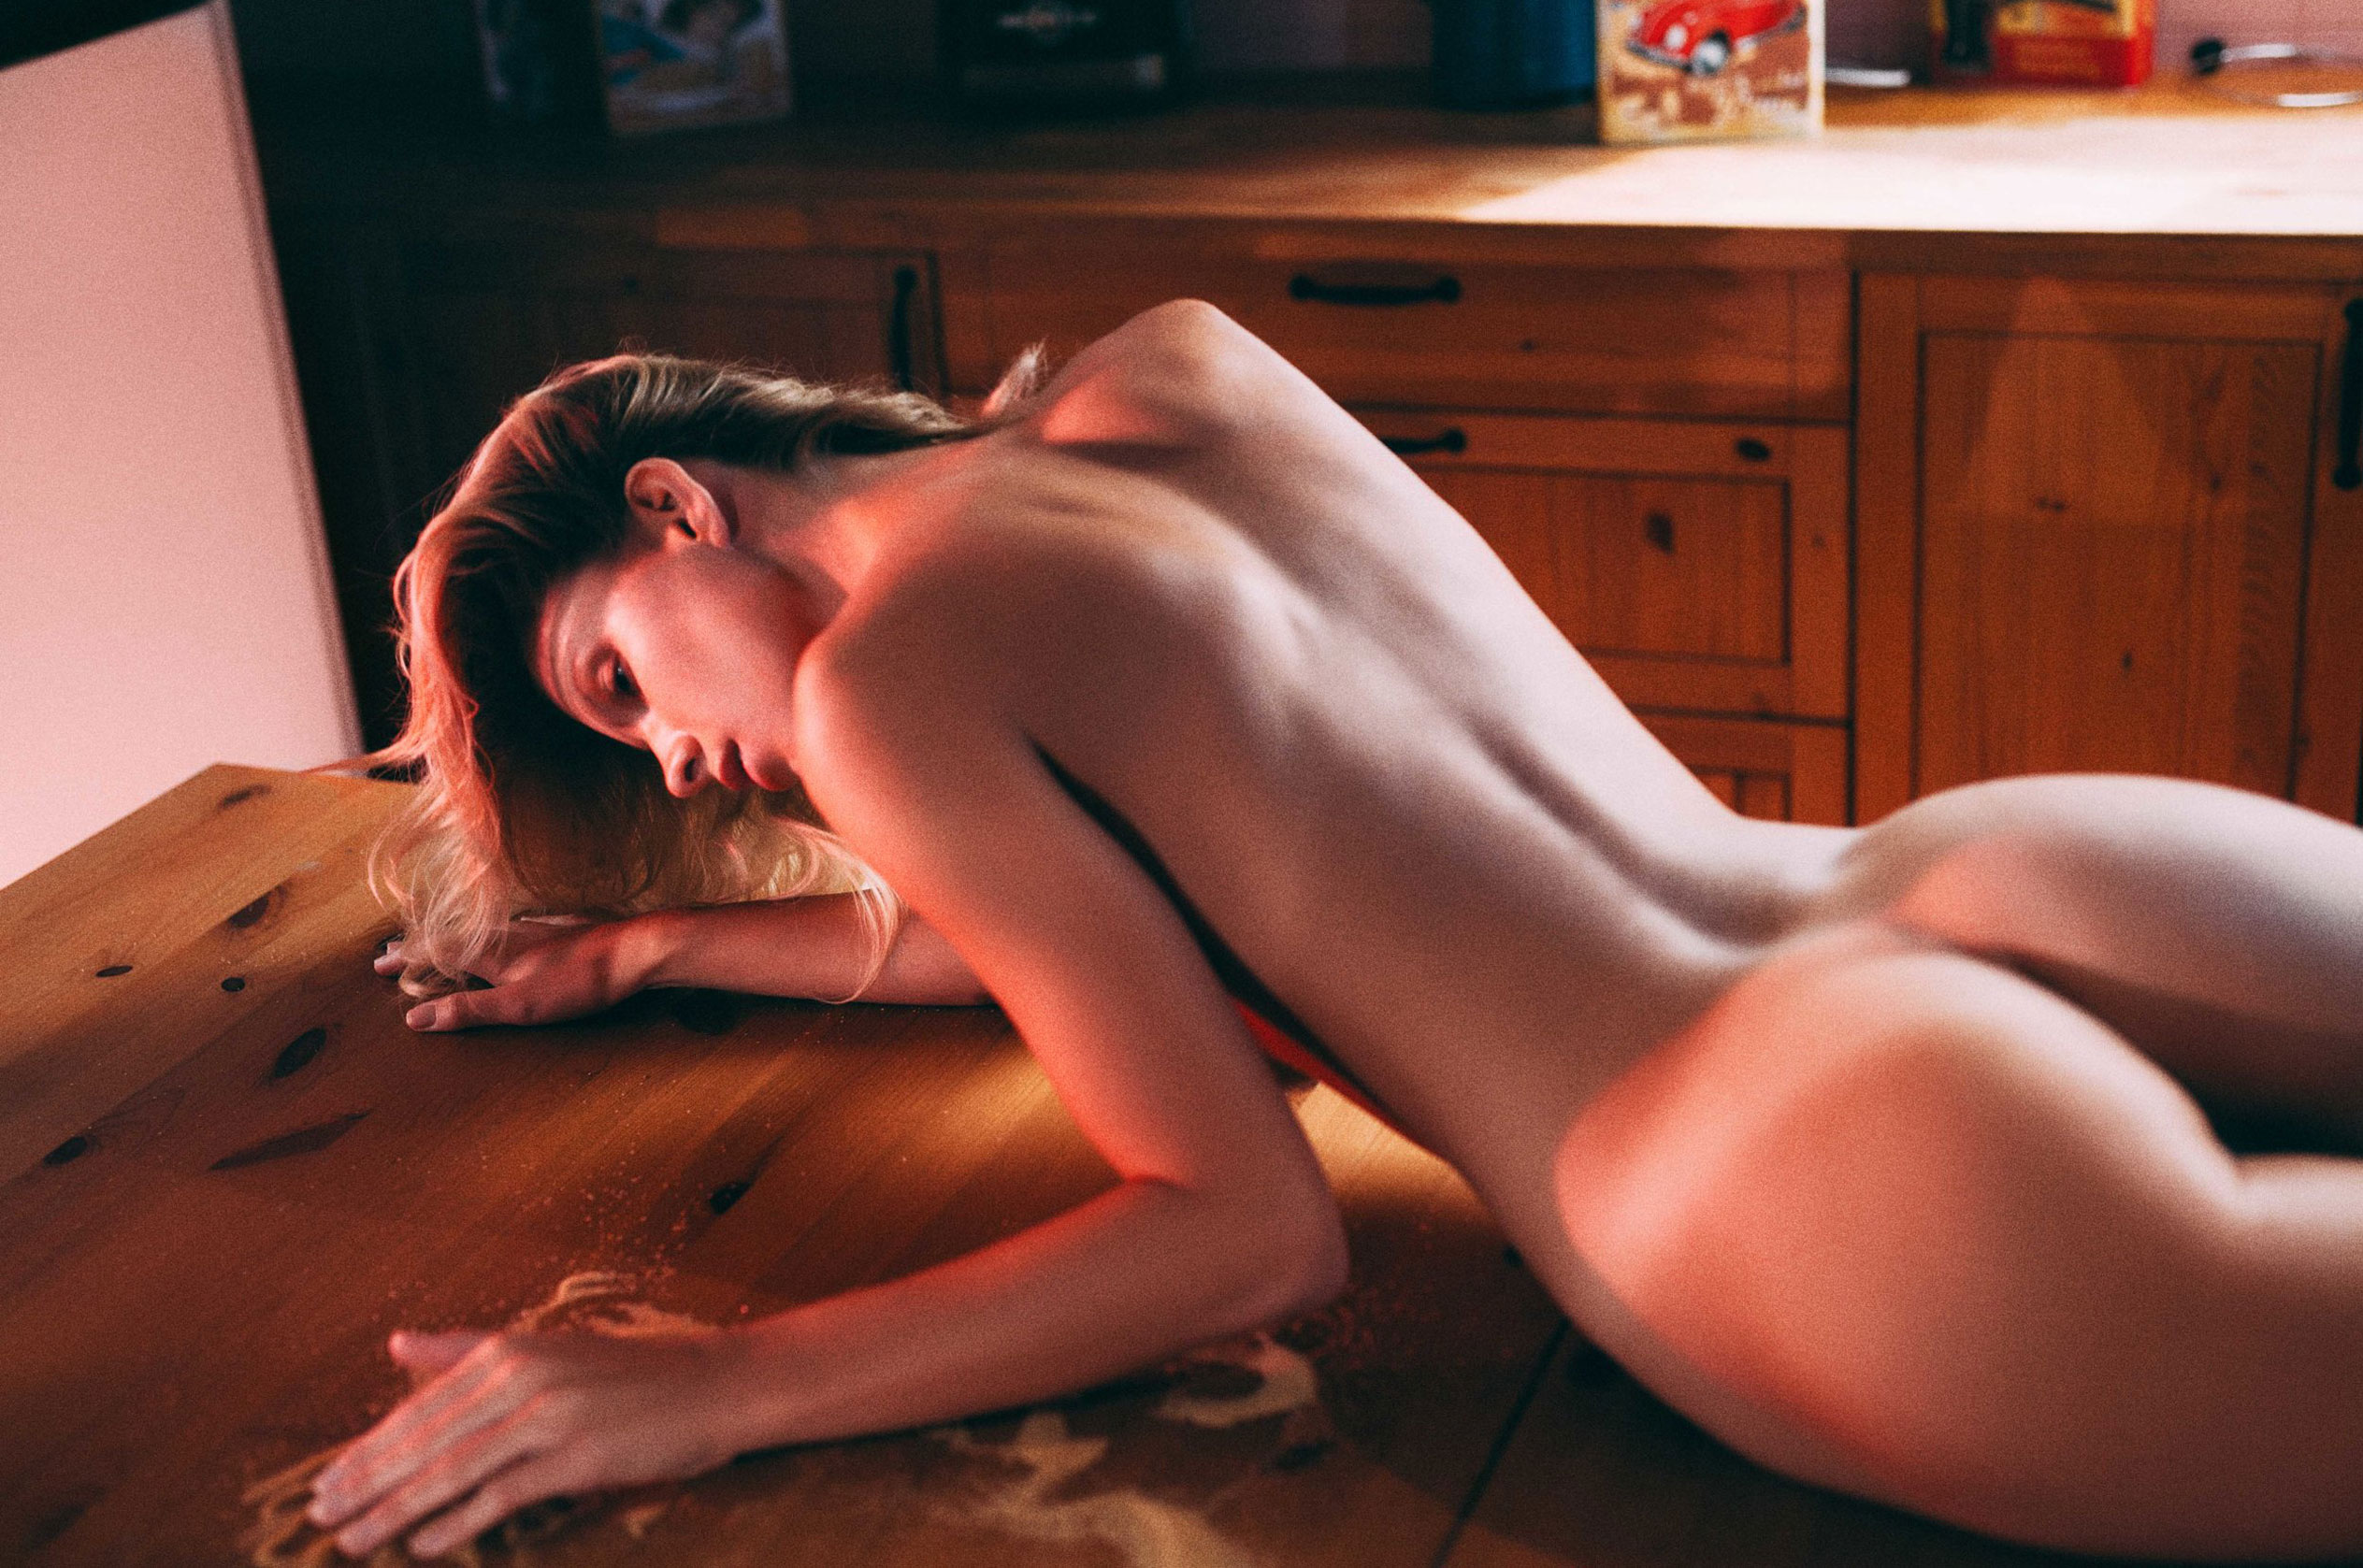 Испытания природой с Анжелой Ольшевской / Angela Olszewska by Szymon Paszko - Pull Me, Push Me and Take Me to the Promised Land / Rekt Magazine